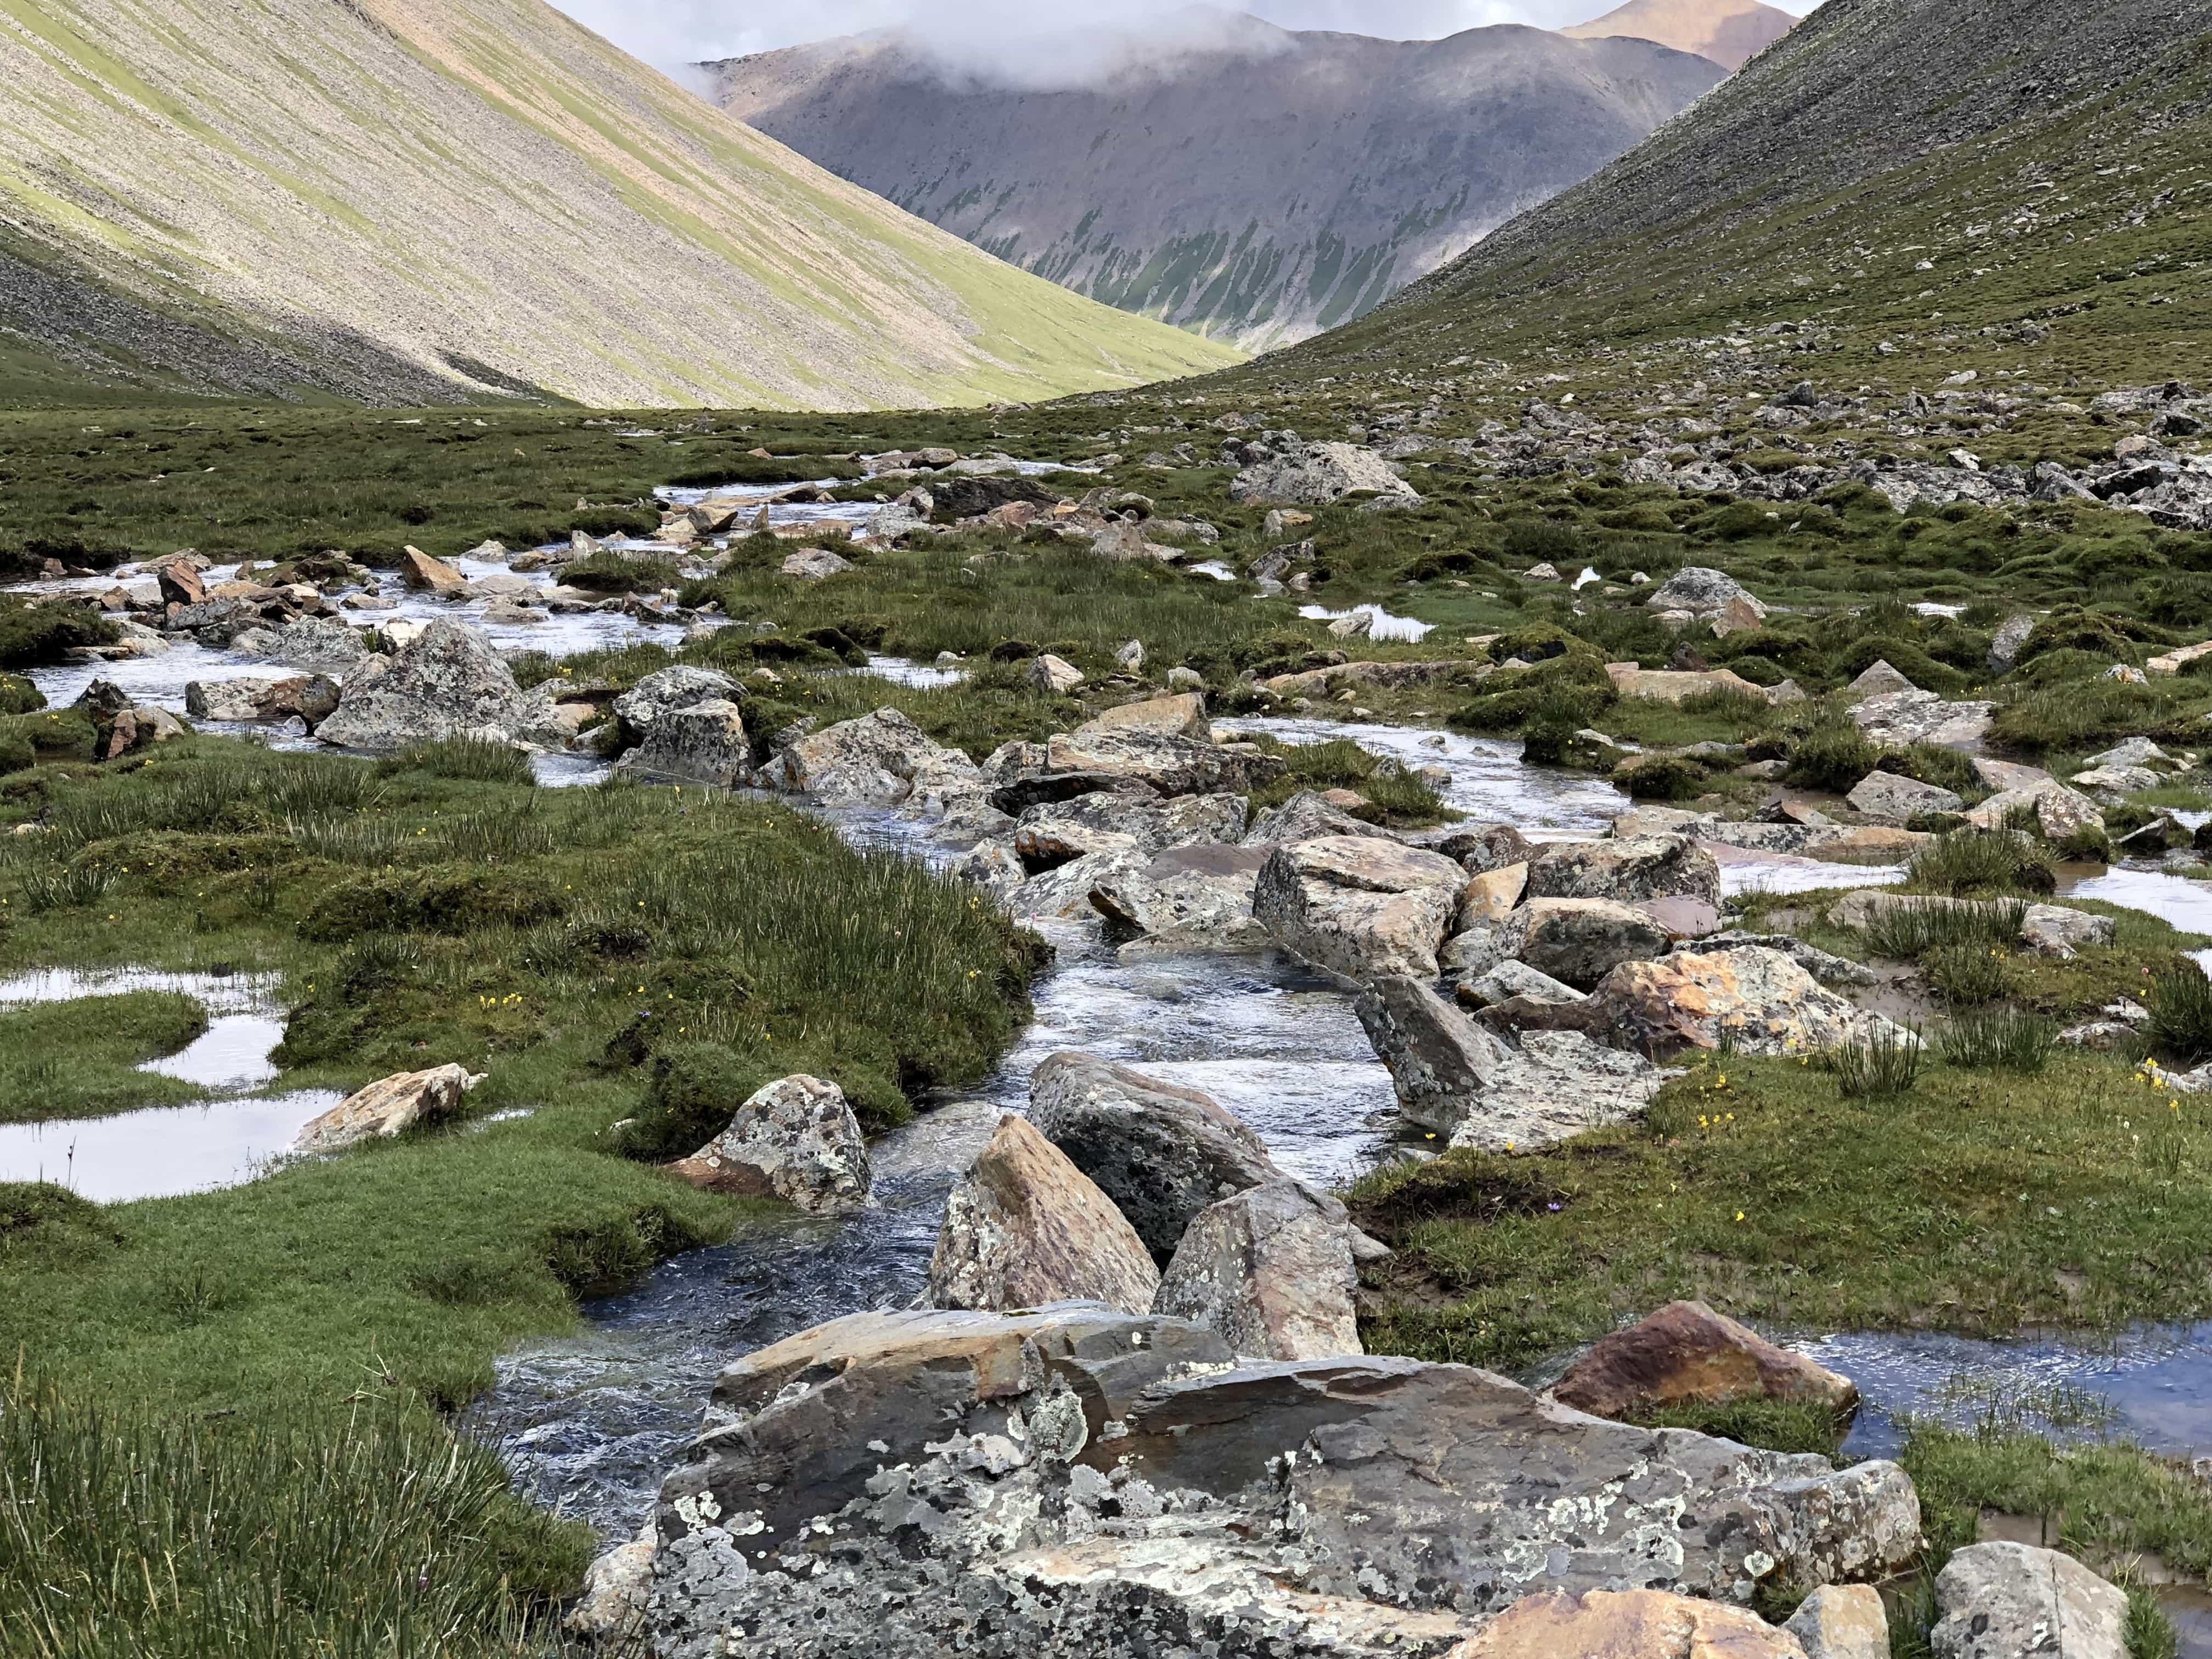 Mountain stream on the trekking route in Tibet